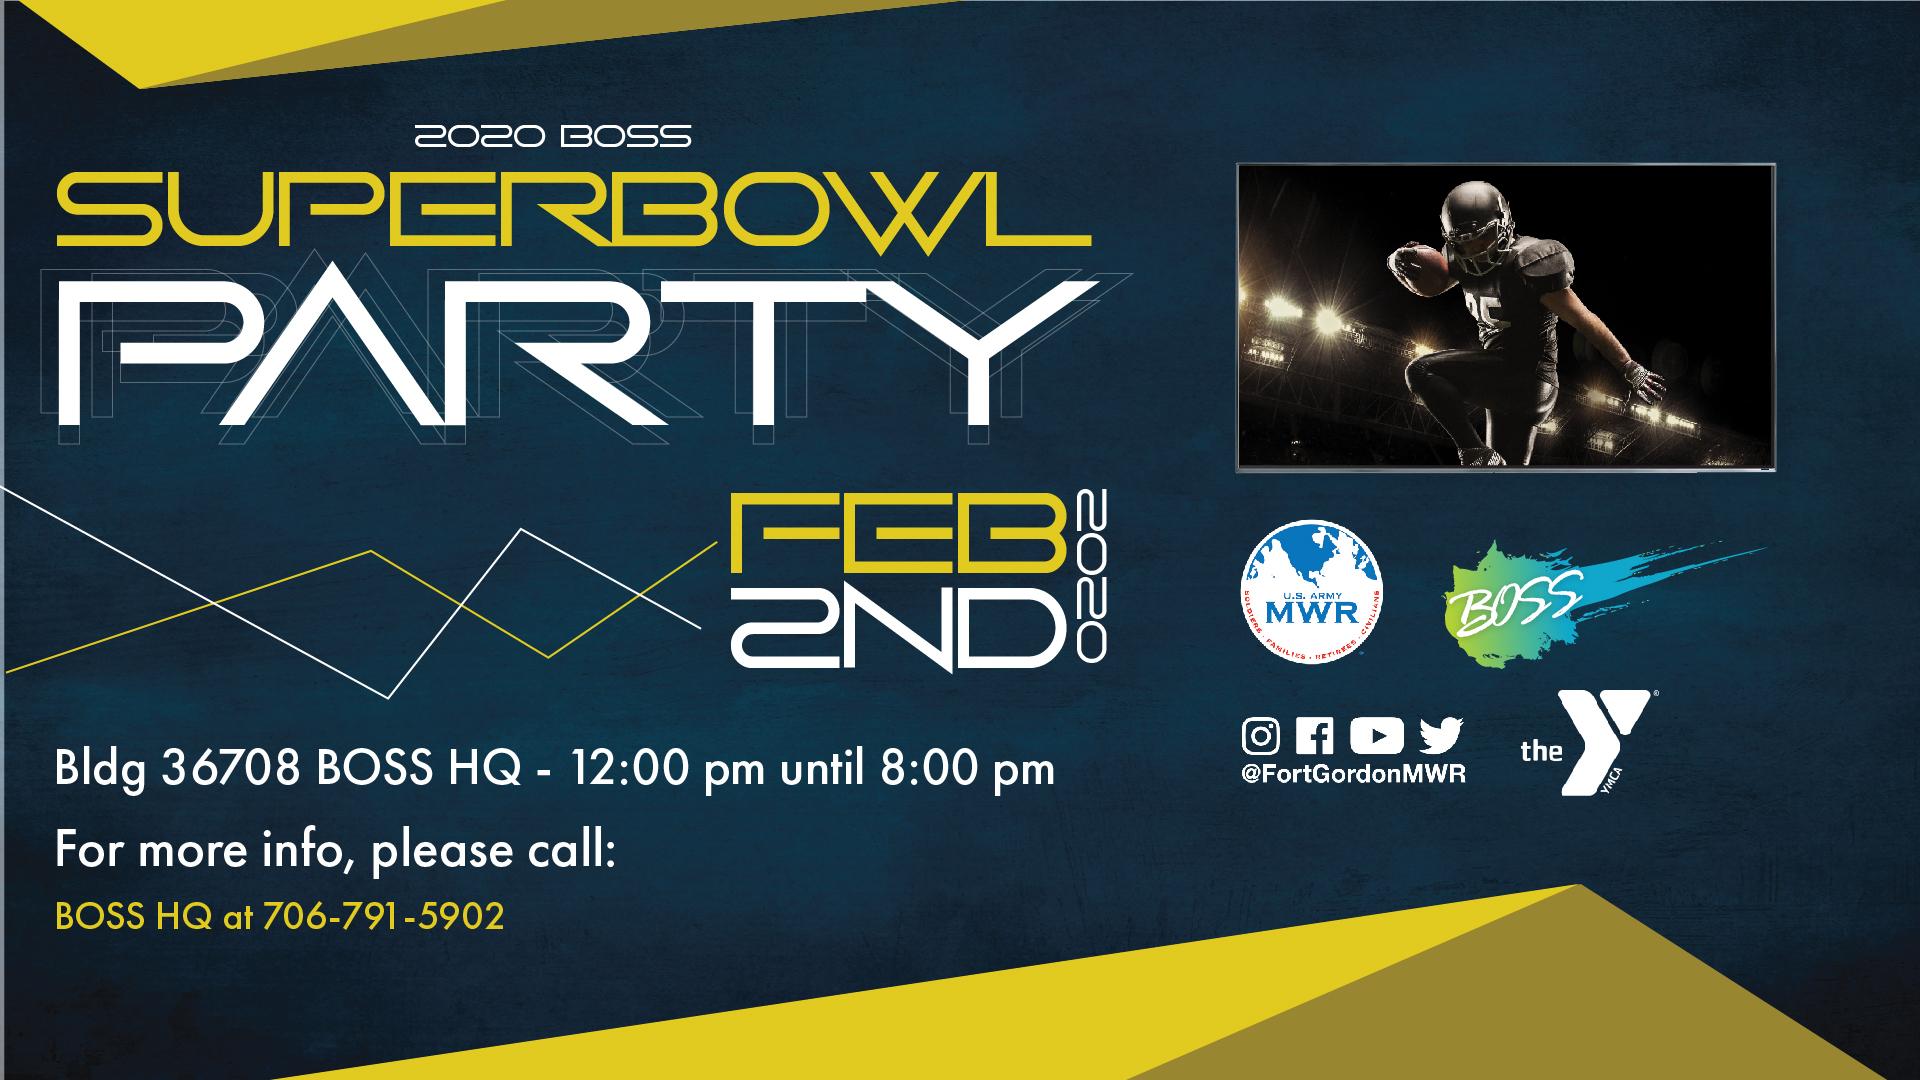 2020 BOSS Super Bowl Party